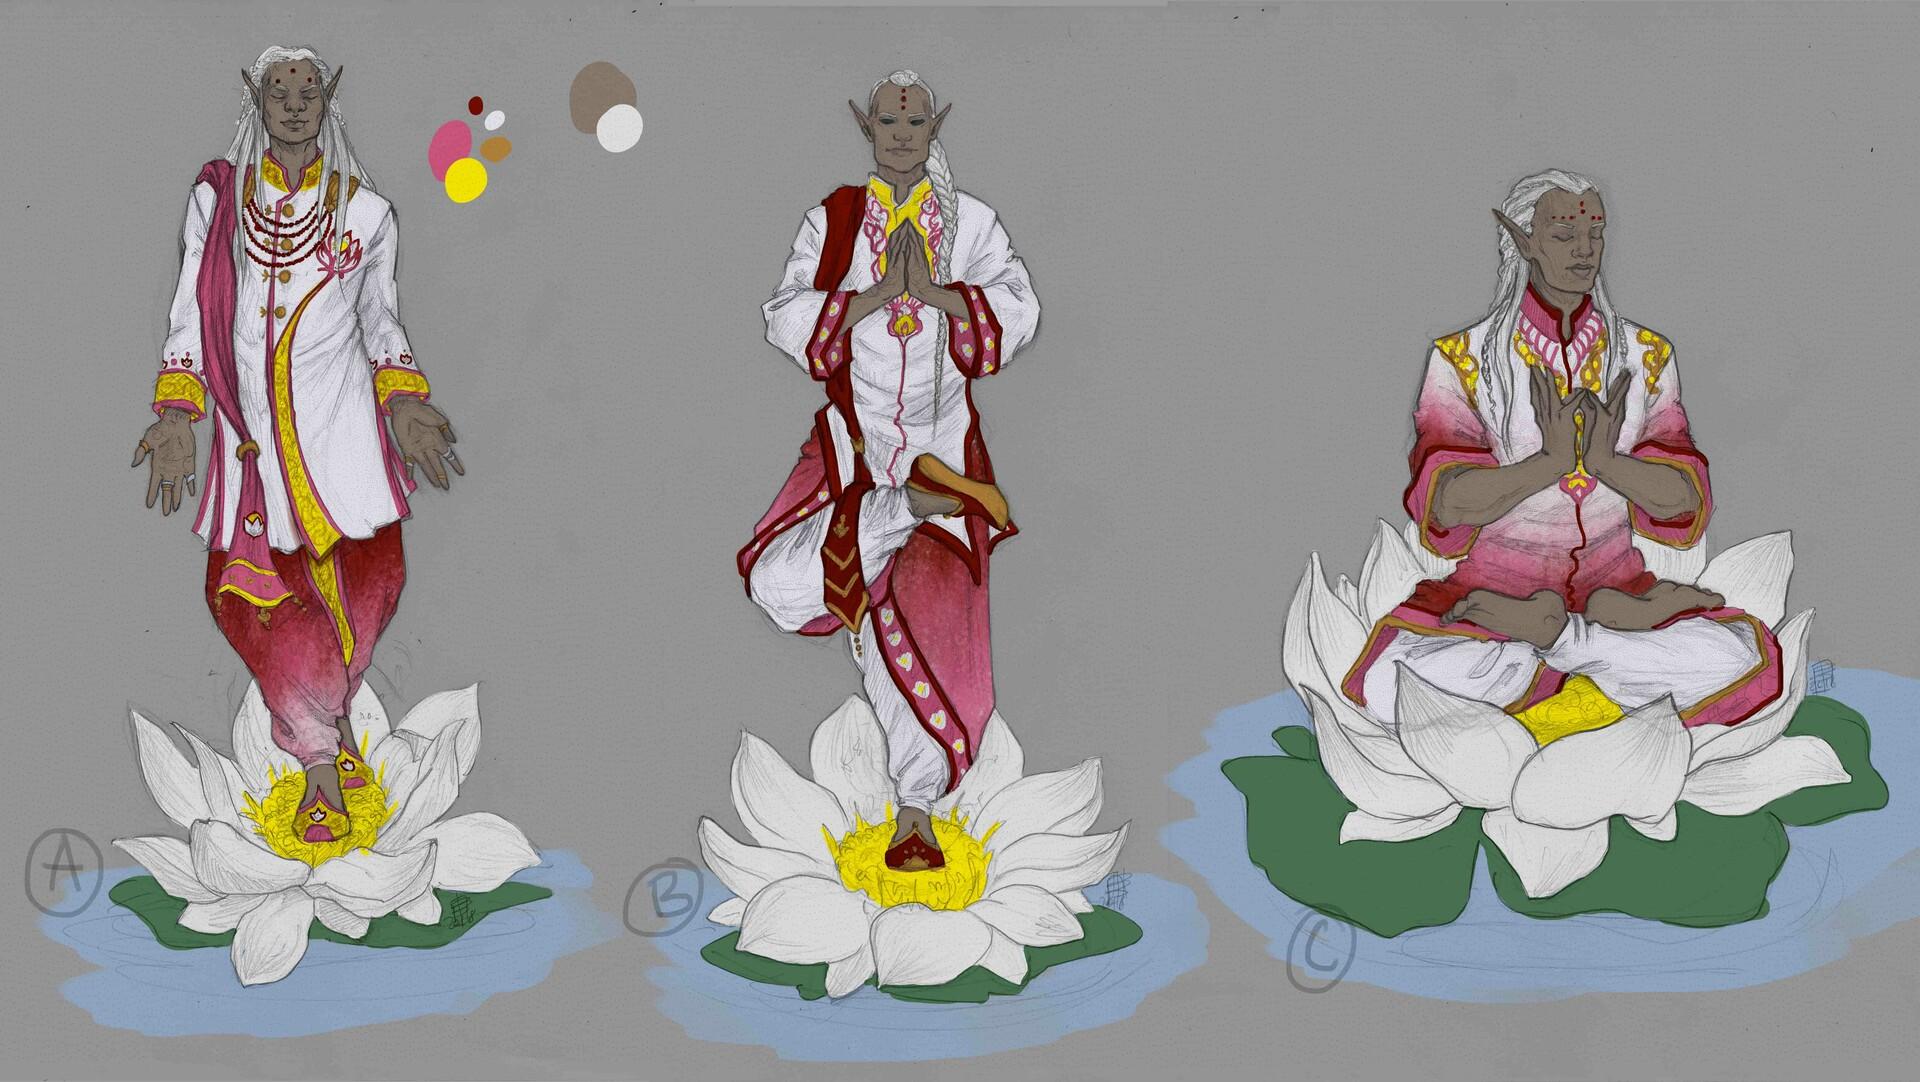 Beatrice pelagatti lotus witch wip1